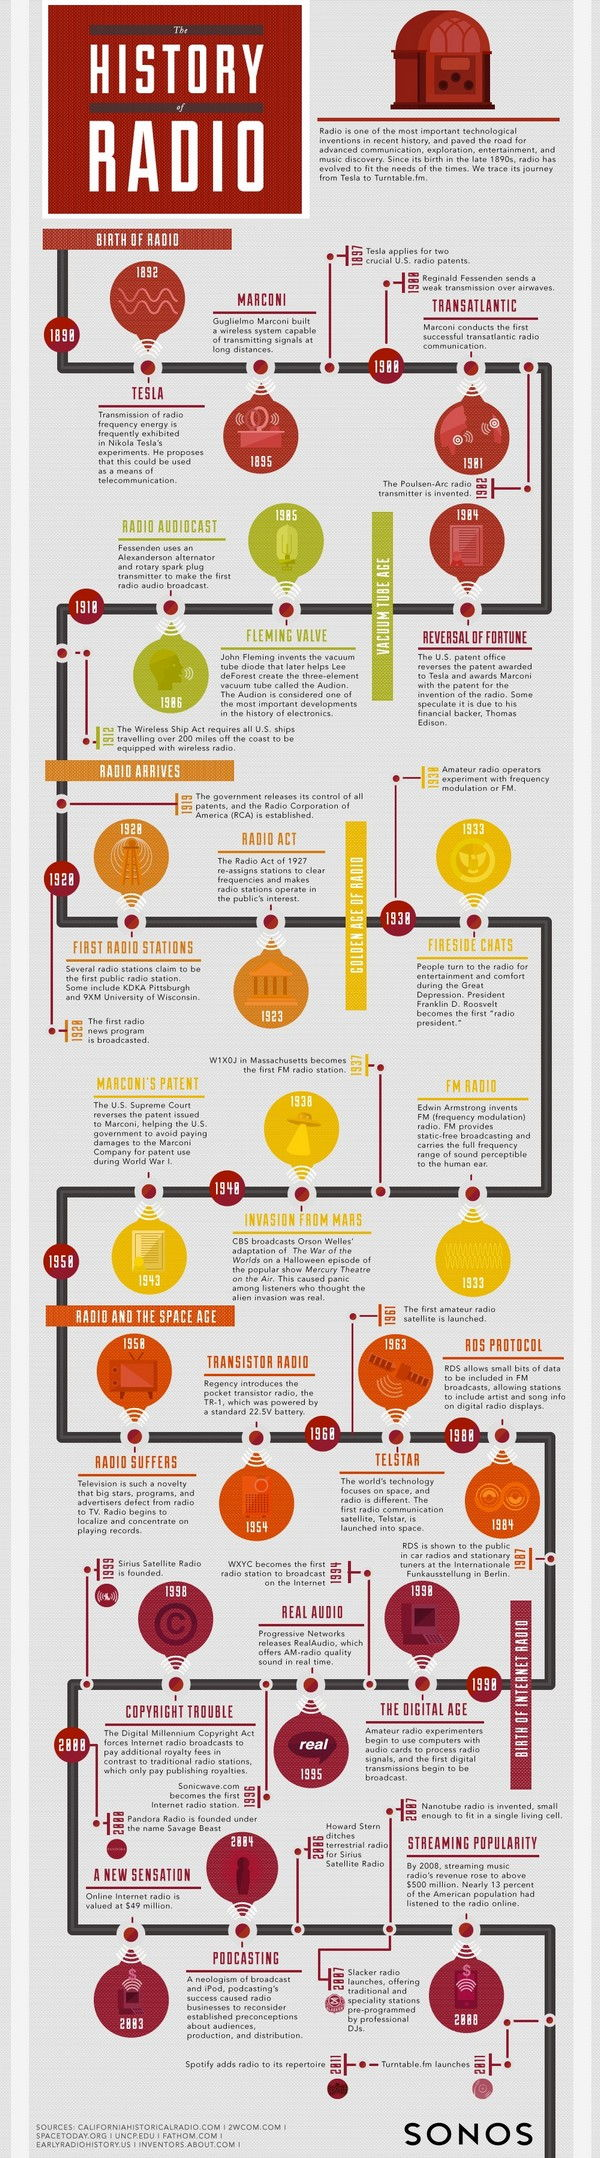 The History of Radio [Infographic]